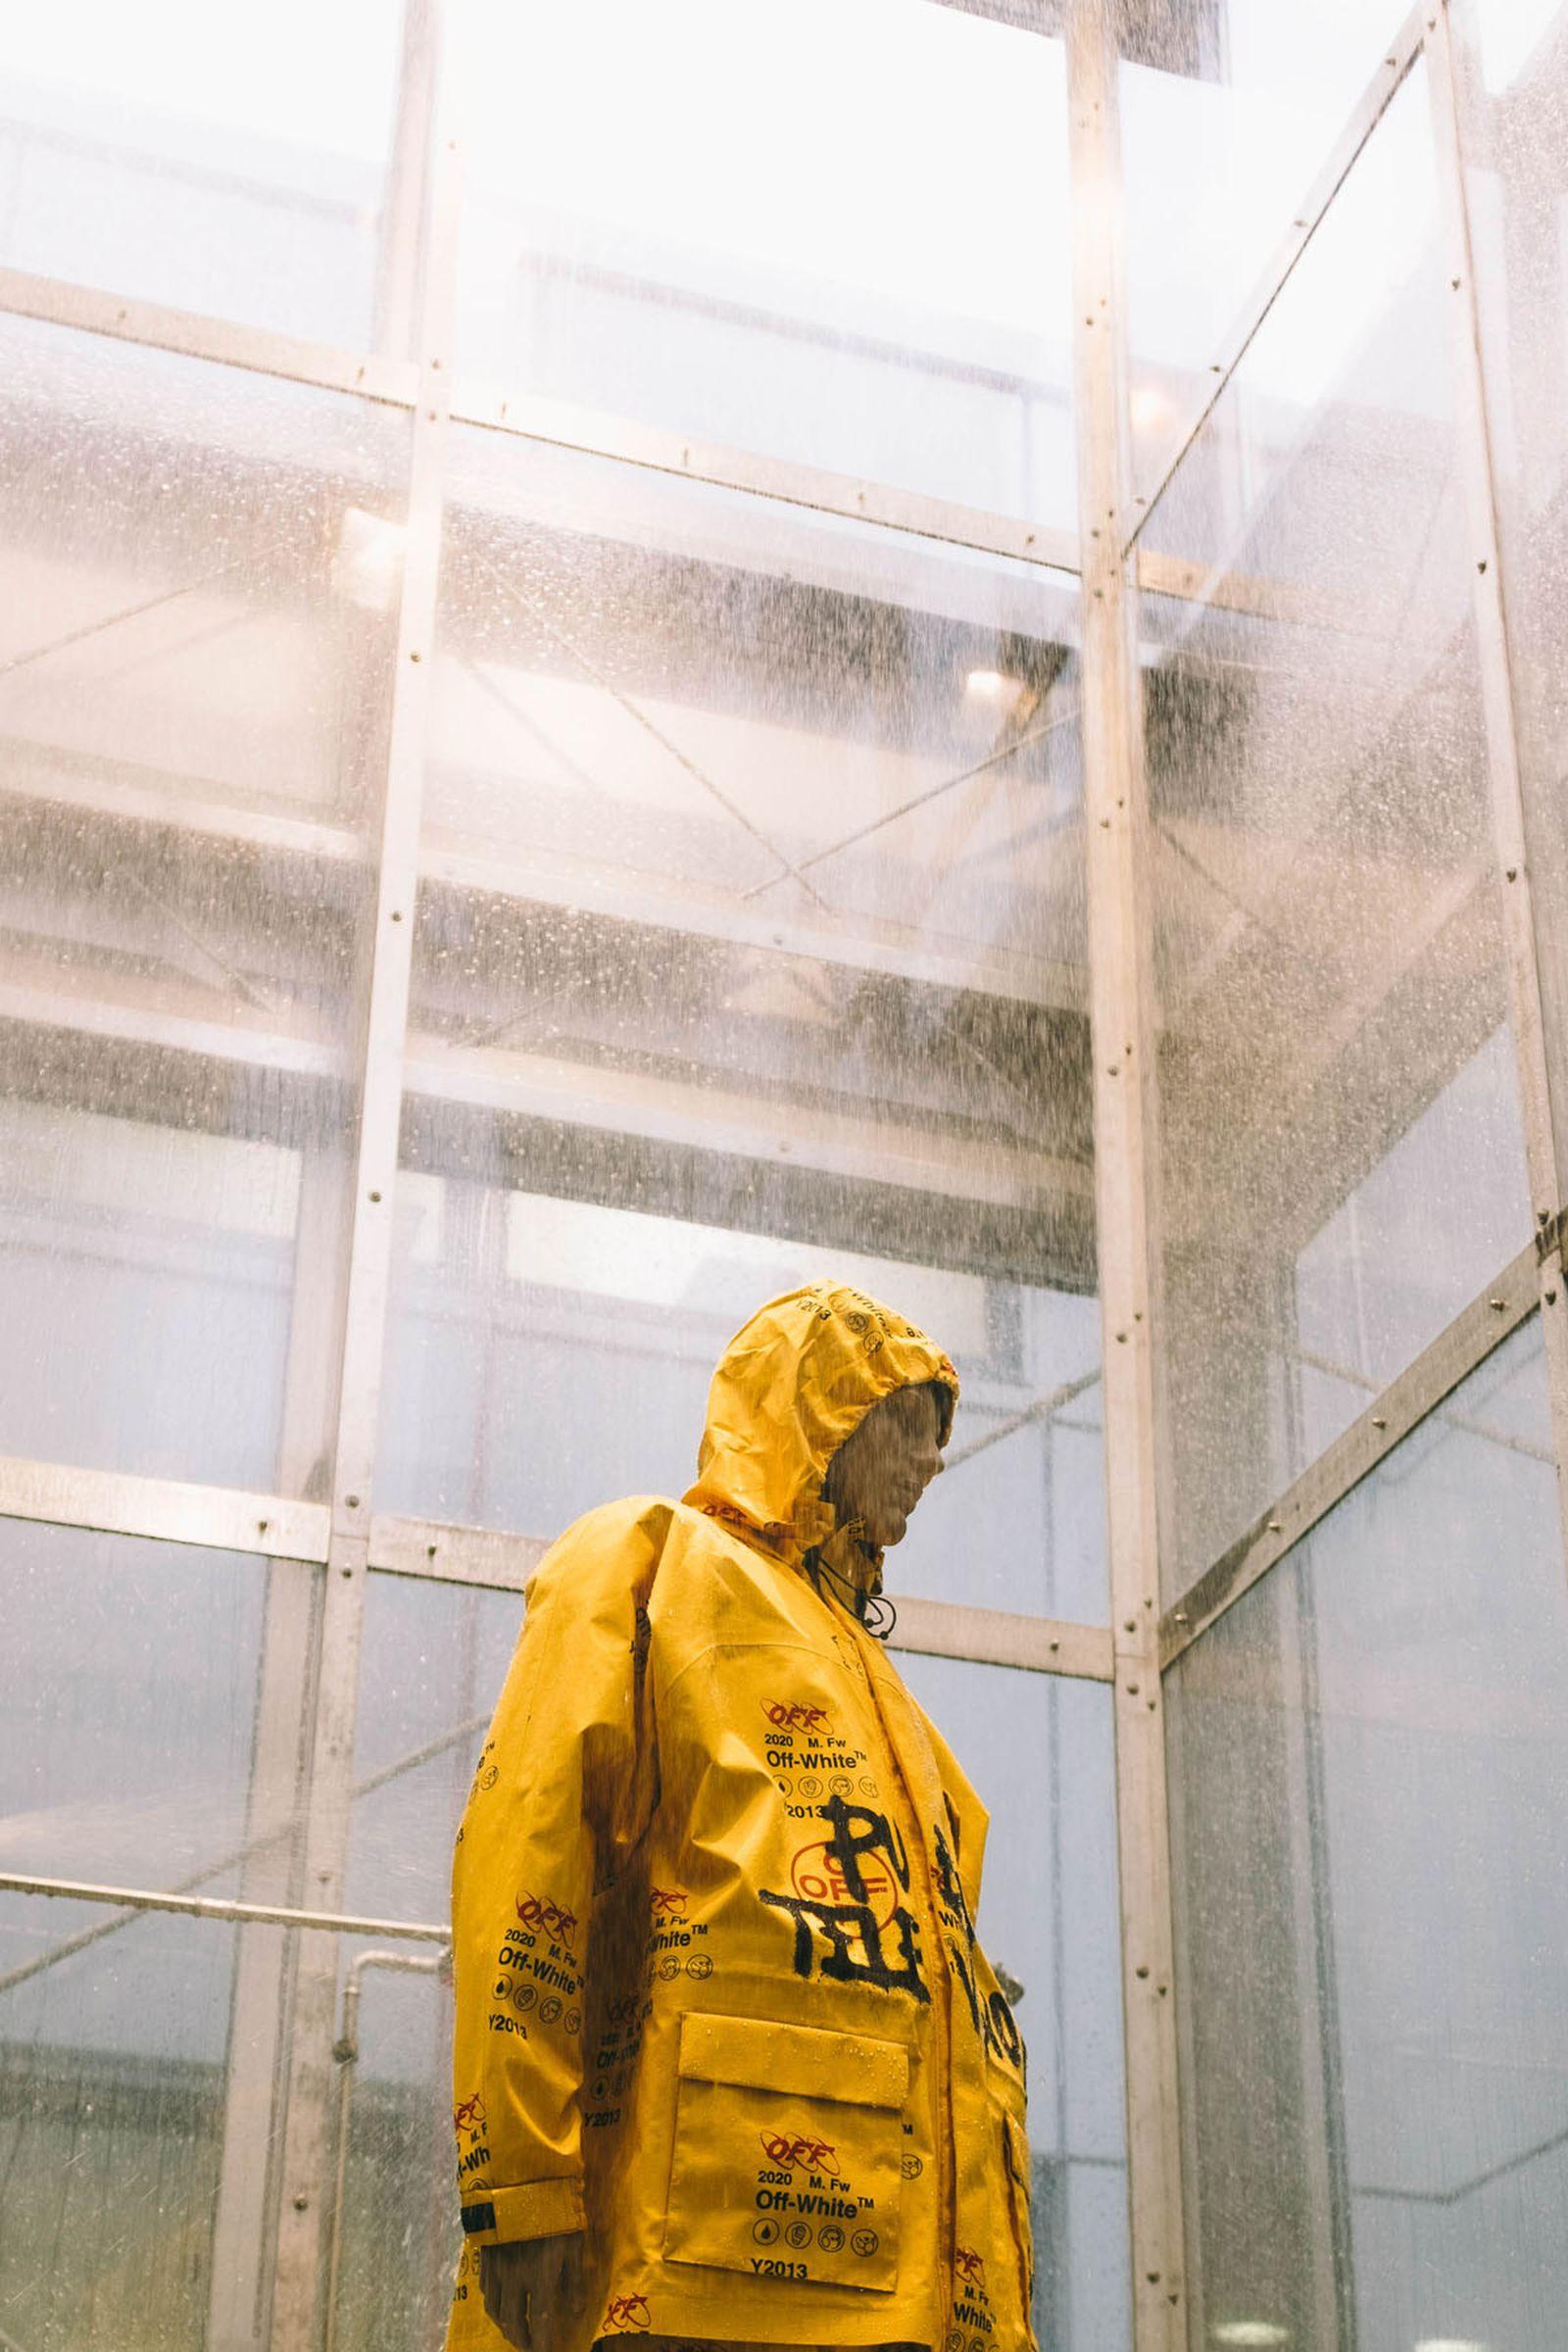 a-look-inside-gore-texs-rain-tower-6